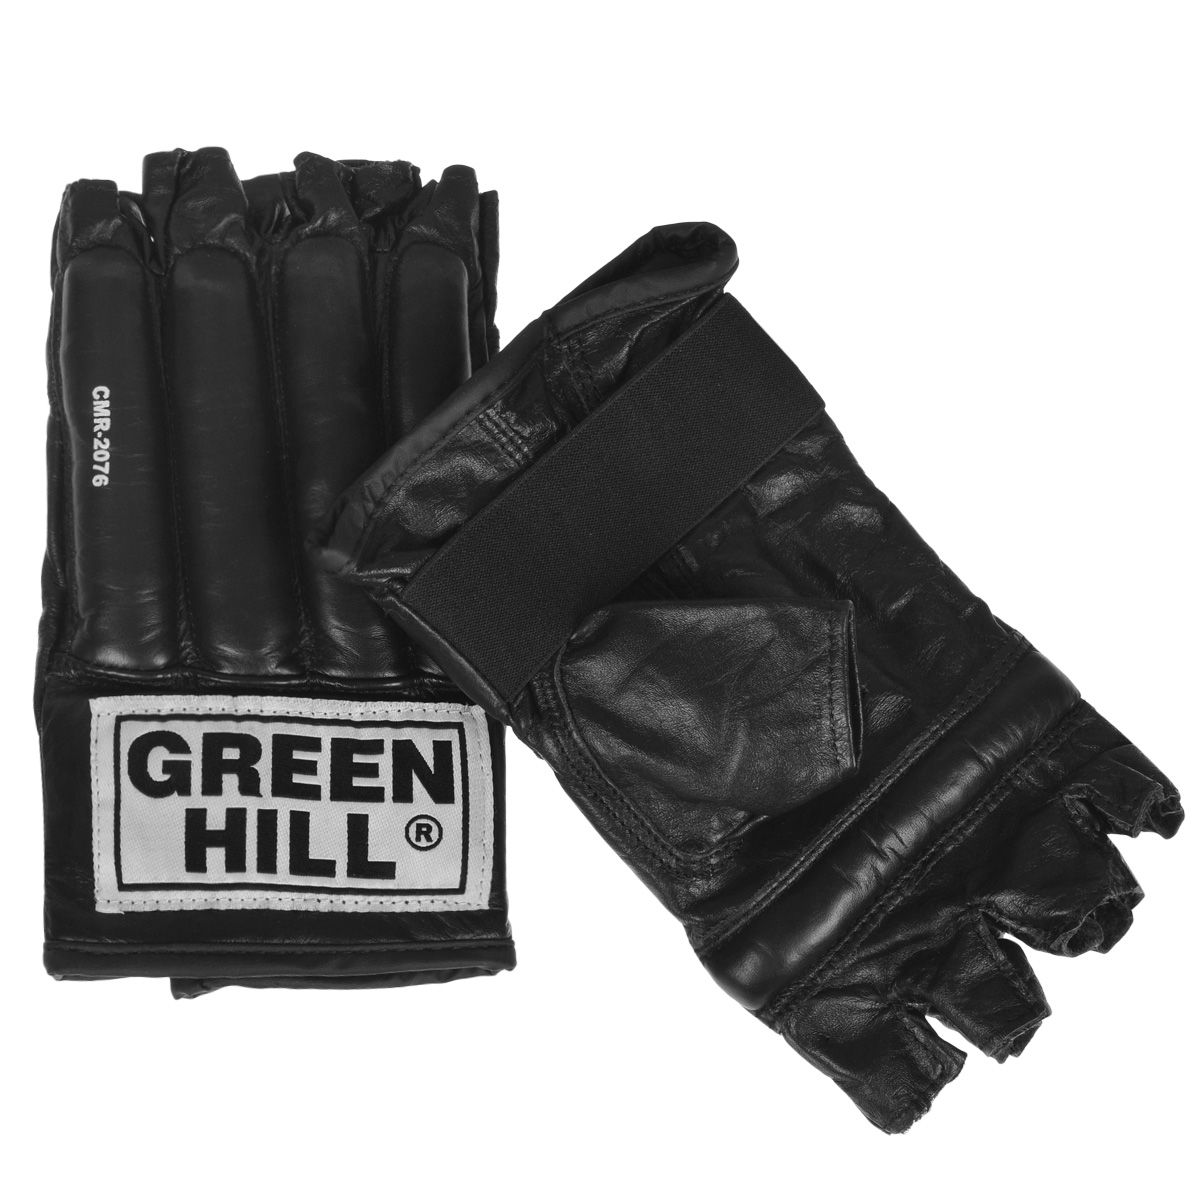 Шингарты для единоборств Green Hill